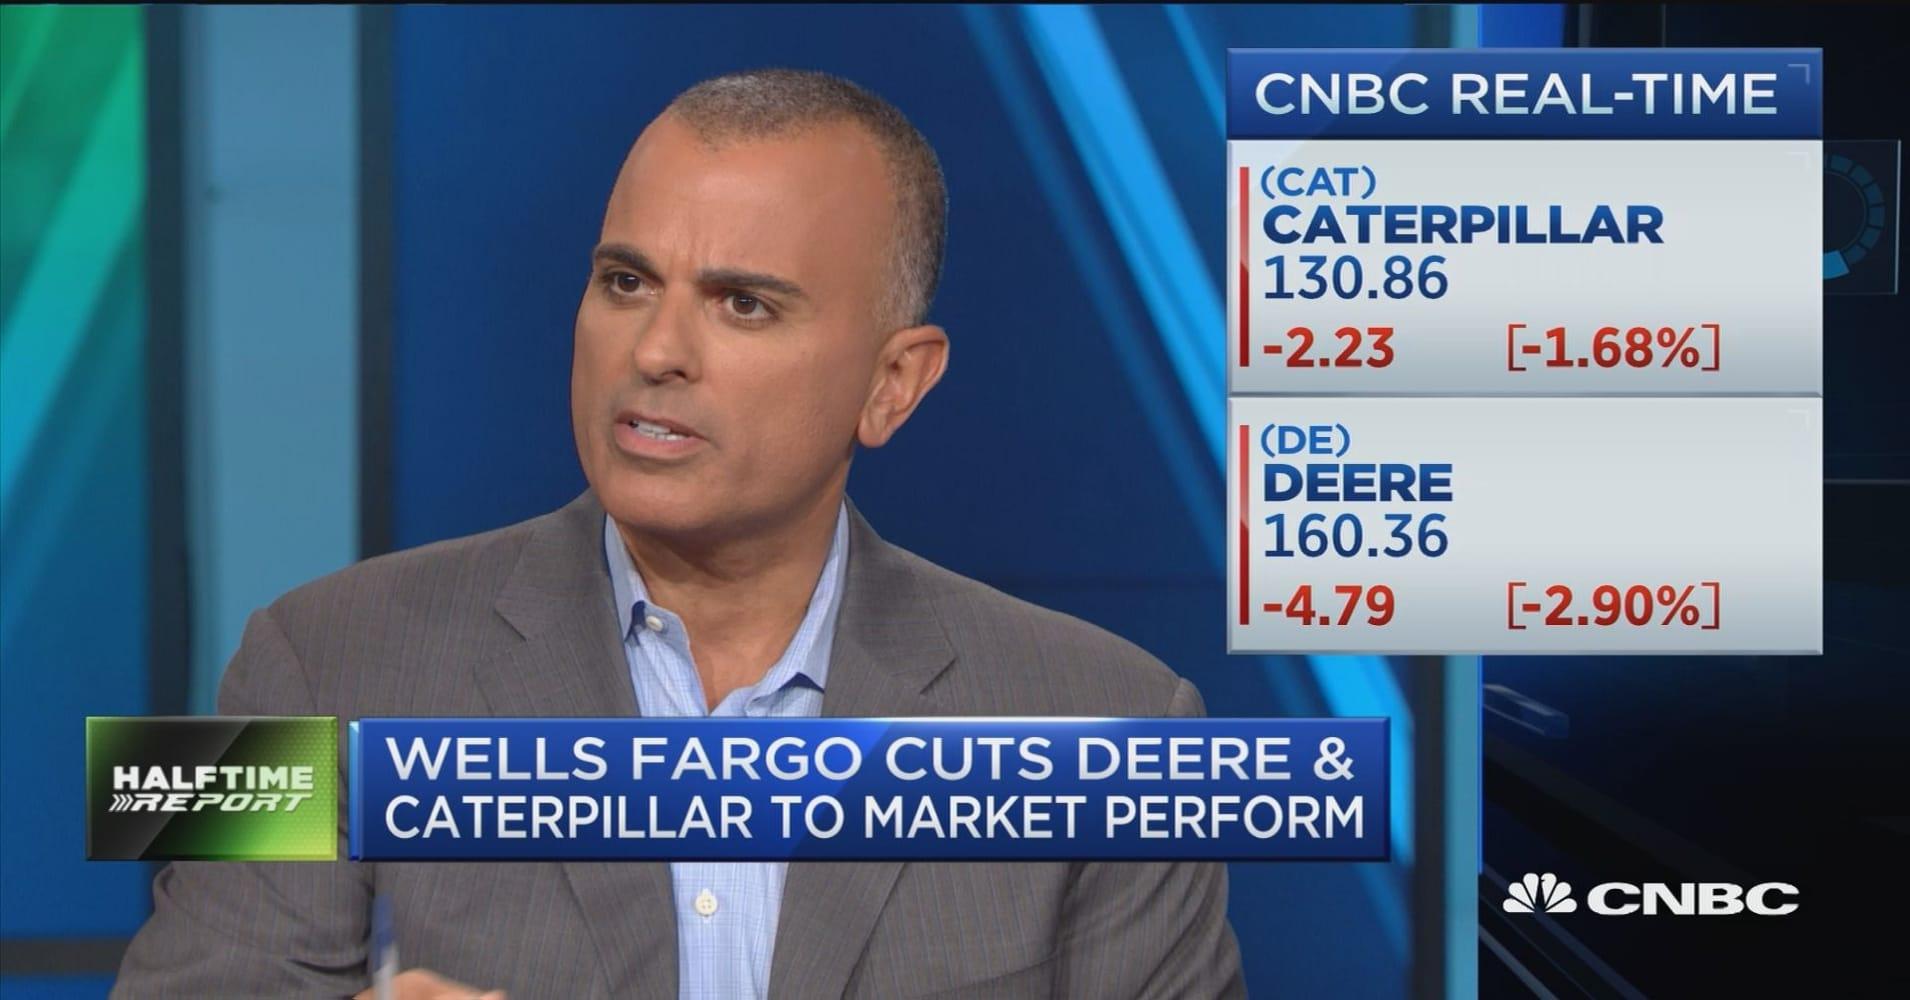 Wells Fargo downgrades Caterpillar and Deere on slowing demand